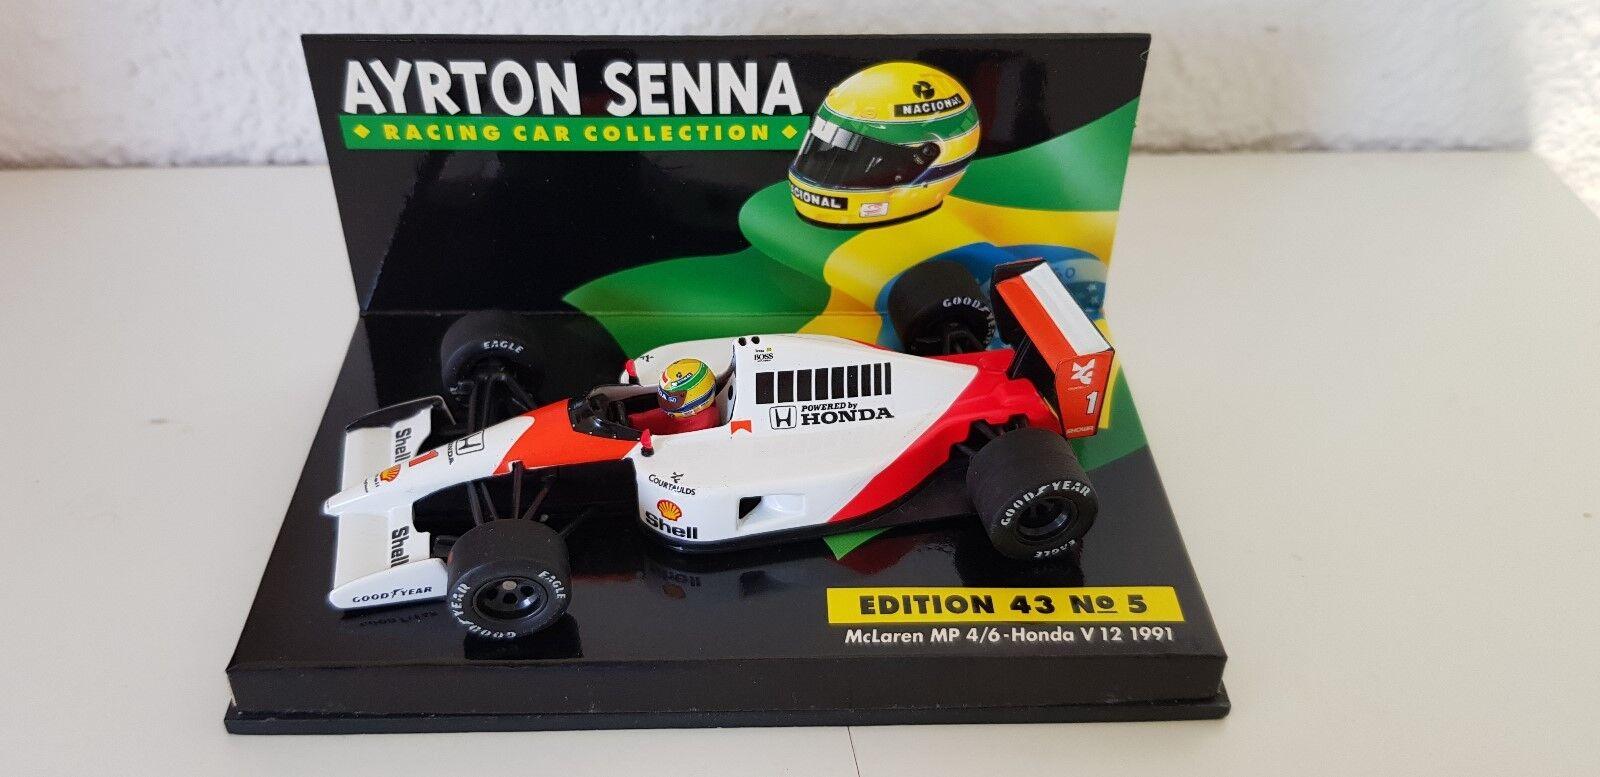 Minichamps 1:43 A. Senna COLLECTION nr 05 McLaren MP 4/6 World Champion 1991